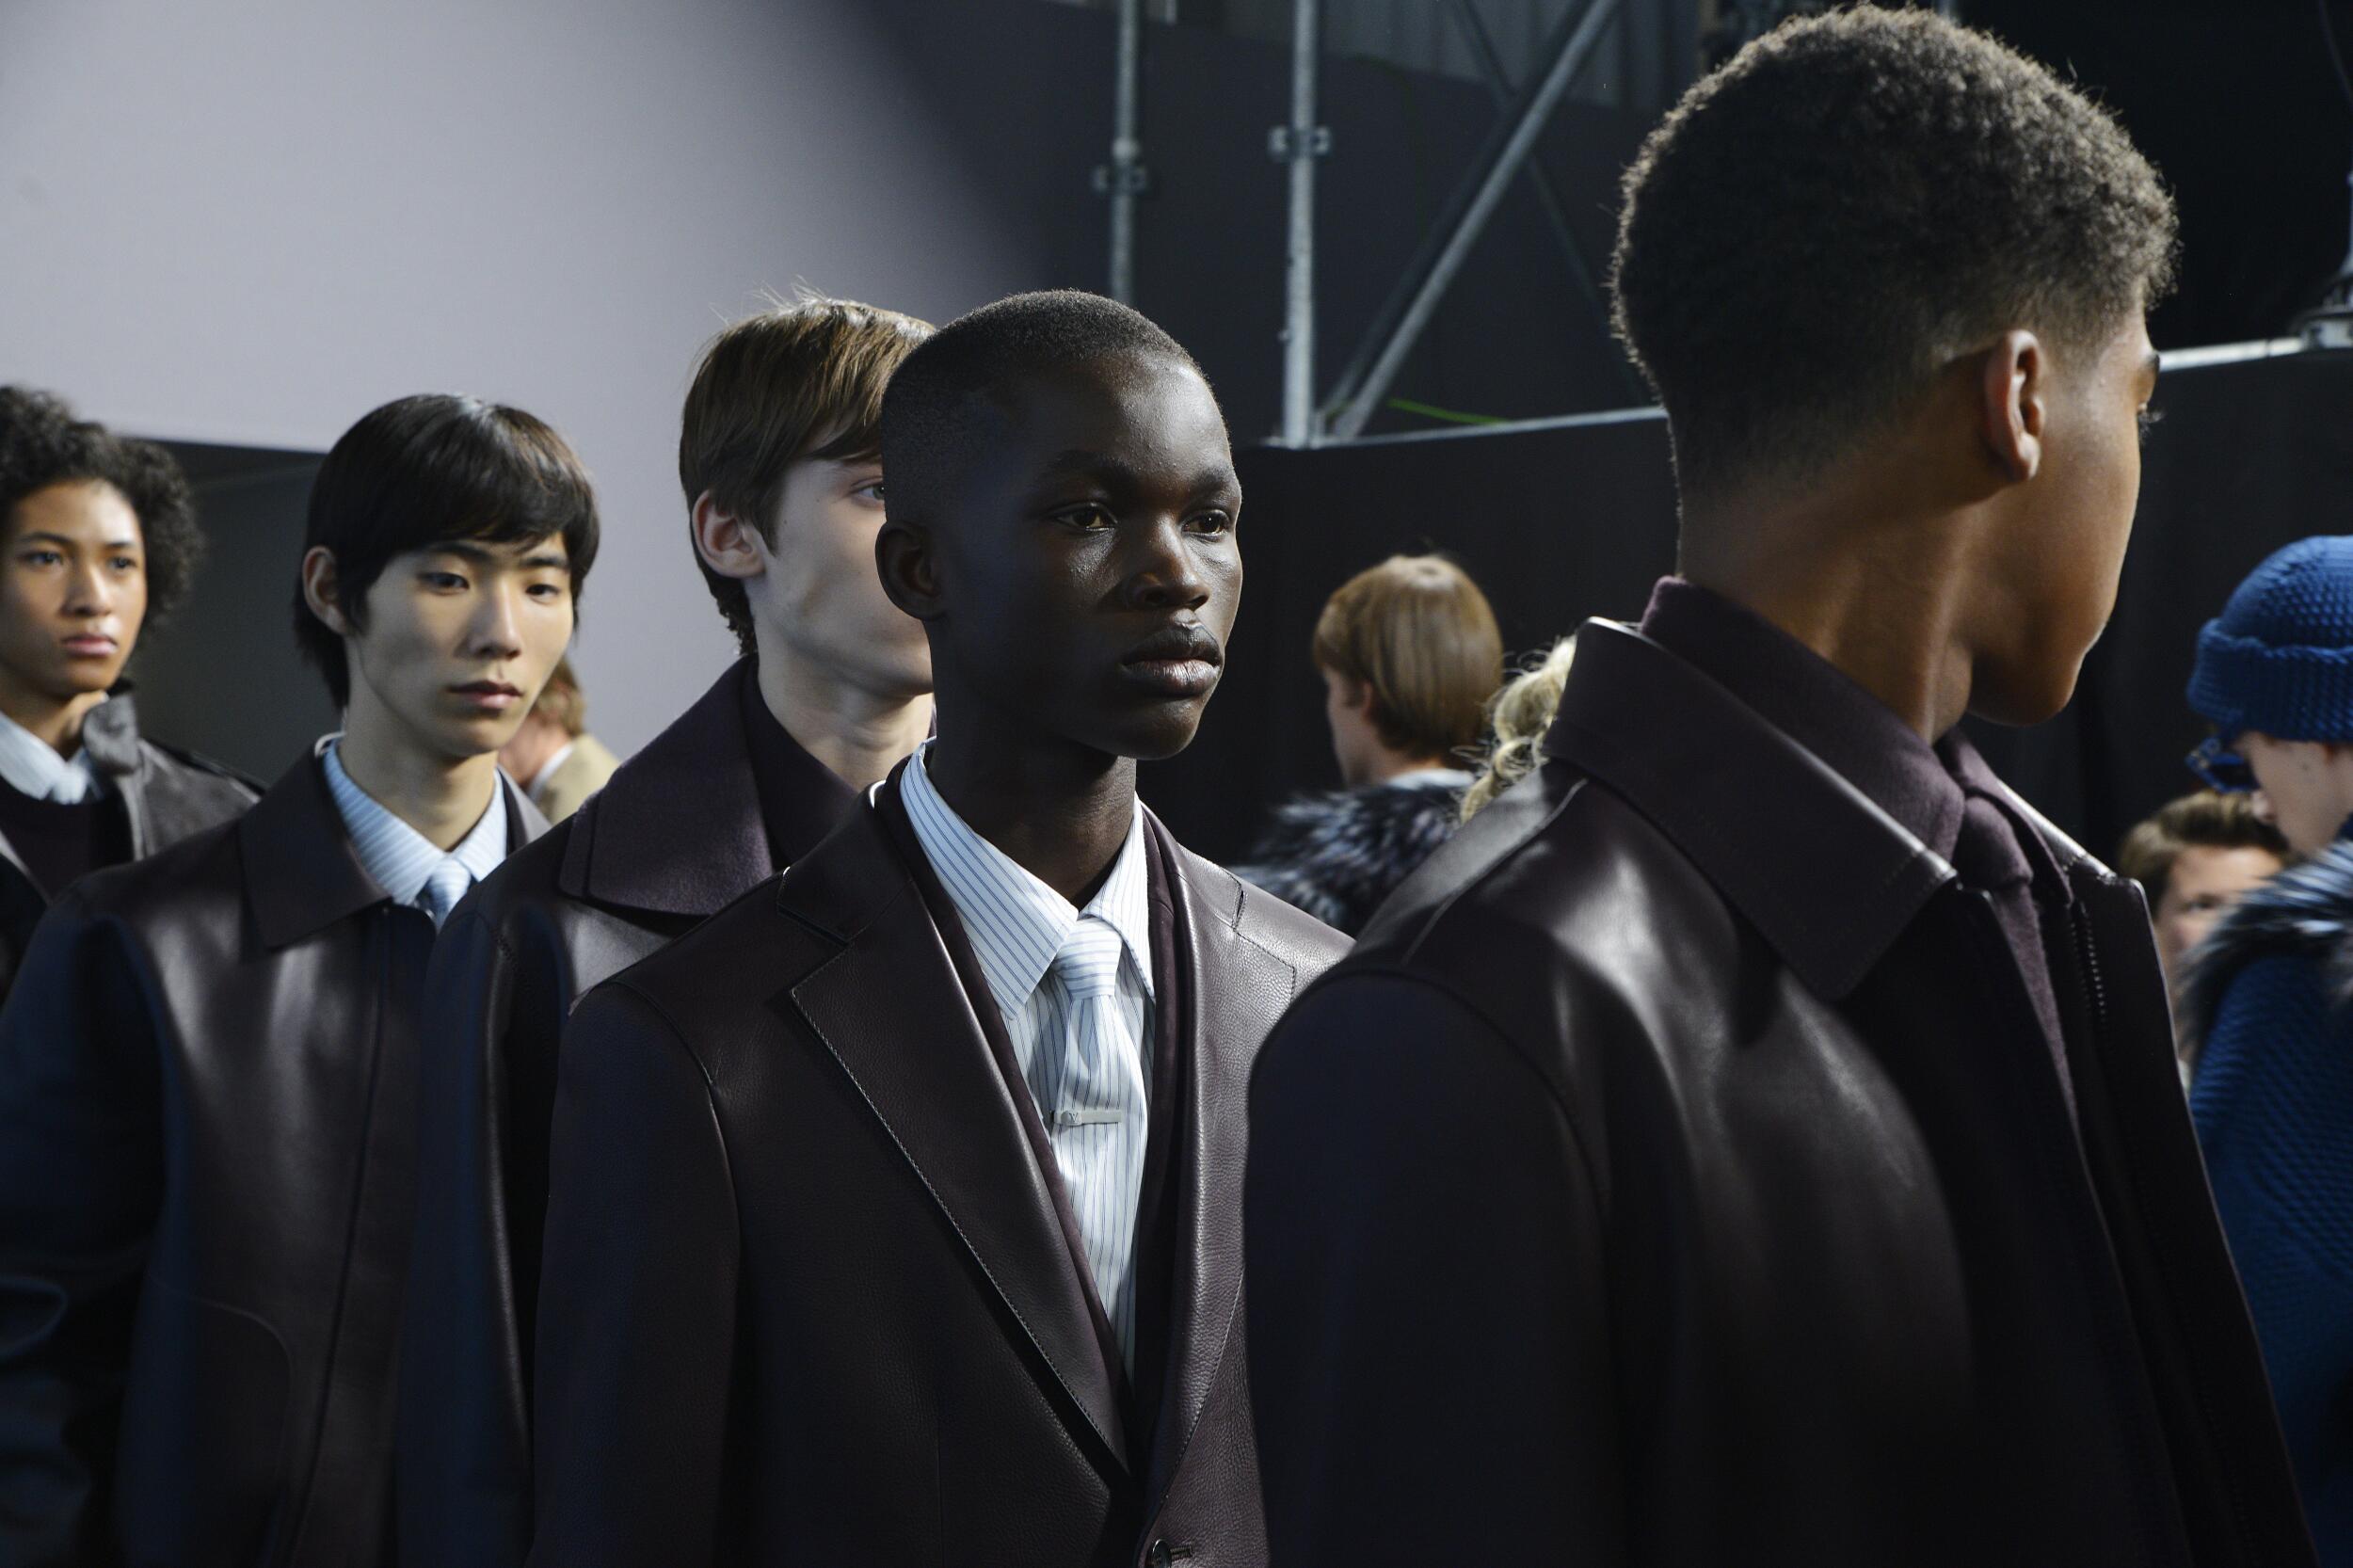 Backstage Louis Vuitton Models Winter 2020 Collection Paris Fashion Week